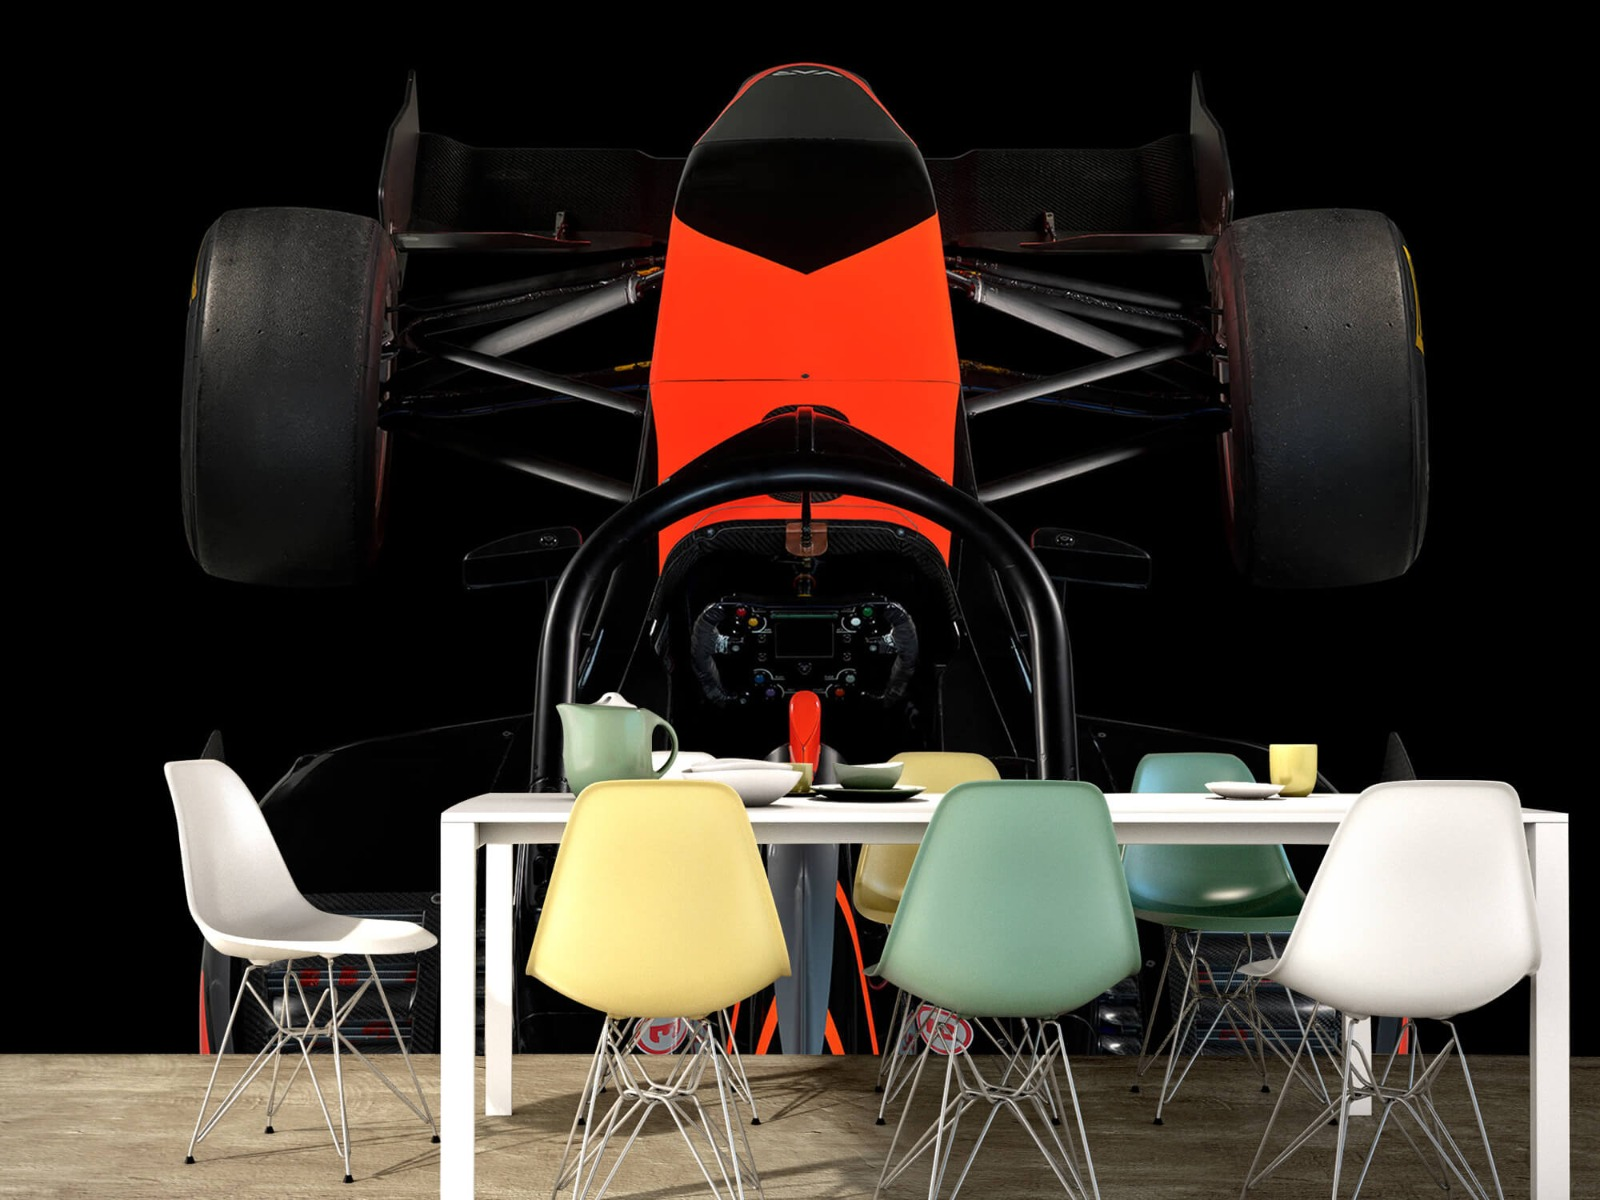 Sportauto's - Formule 3 - Cockpit view - dark - Tienerkamer 14